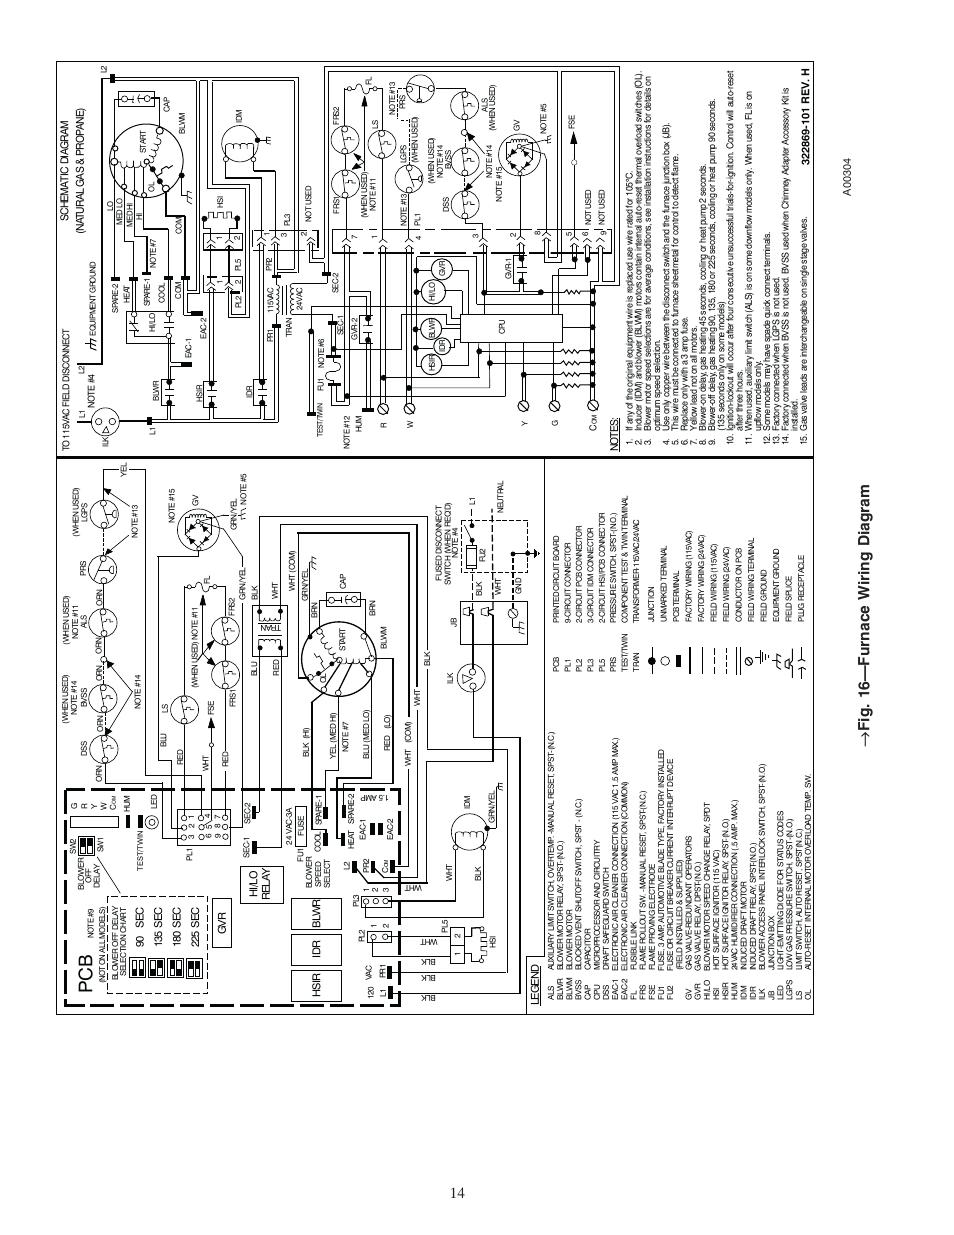 carrier furnace wiring wiring diagramfig 16 u2014furnace wiring diagram carrier weathermaker 8000 58zav16